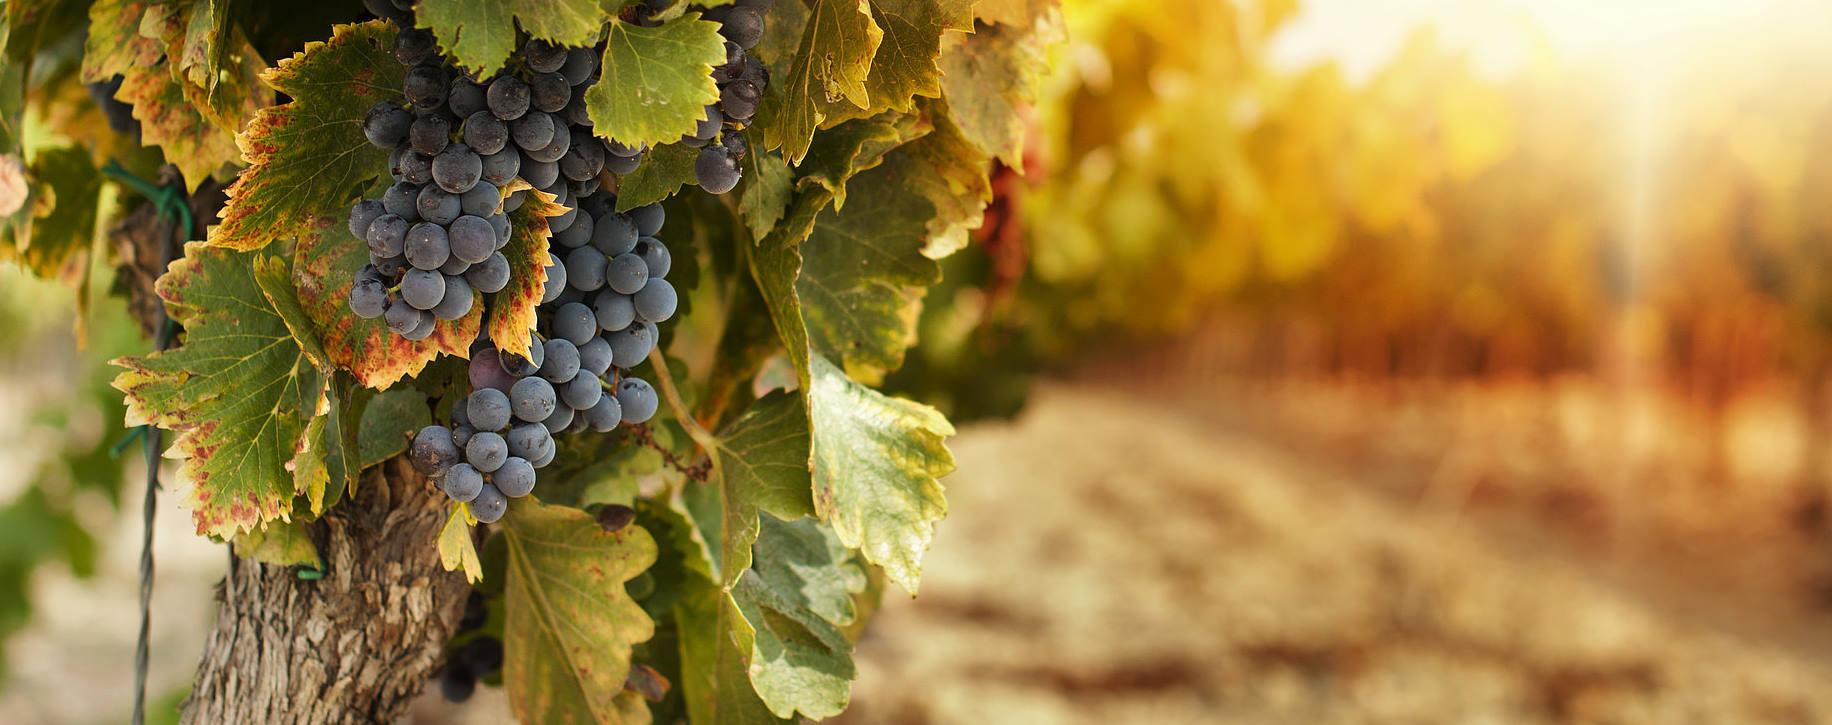 vinograd 4.jpg